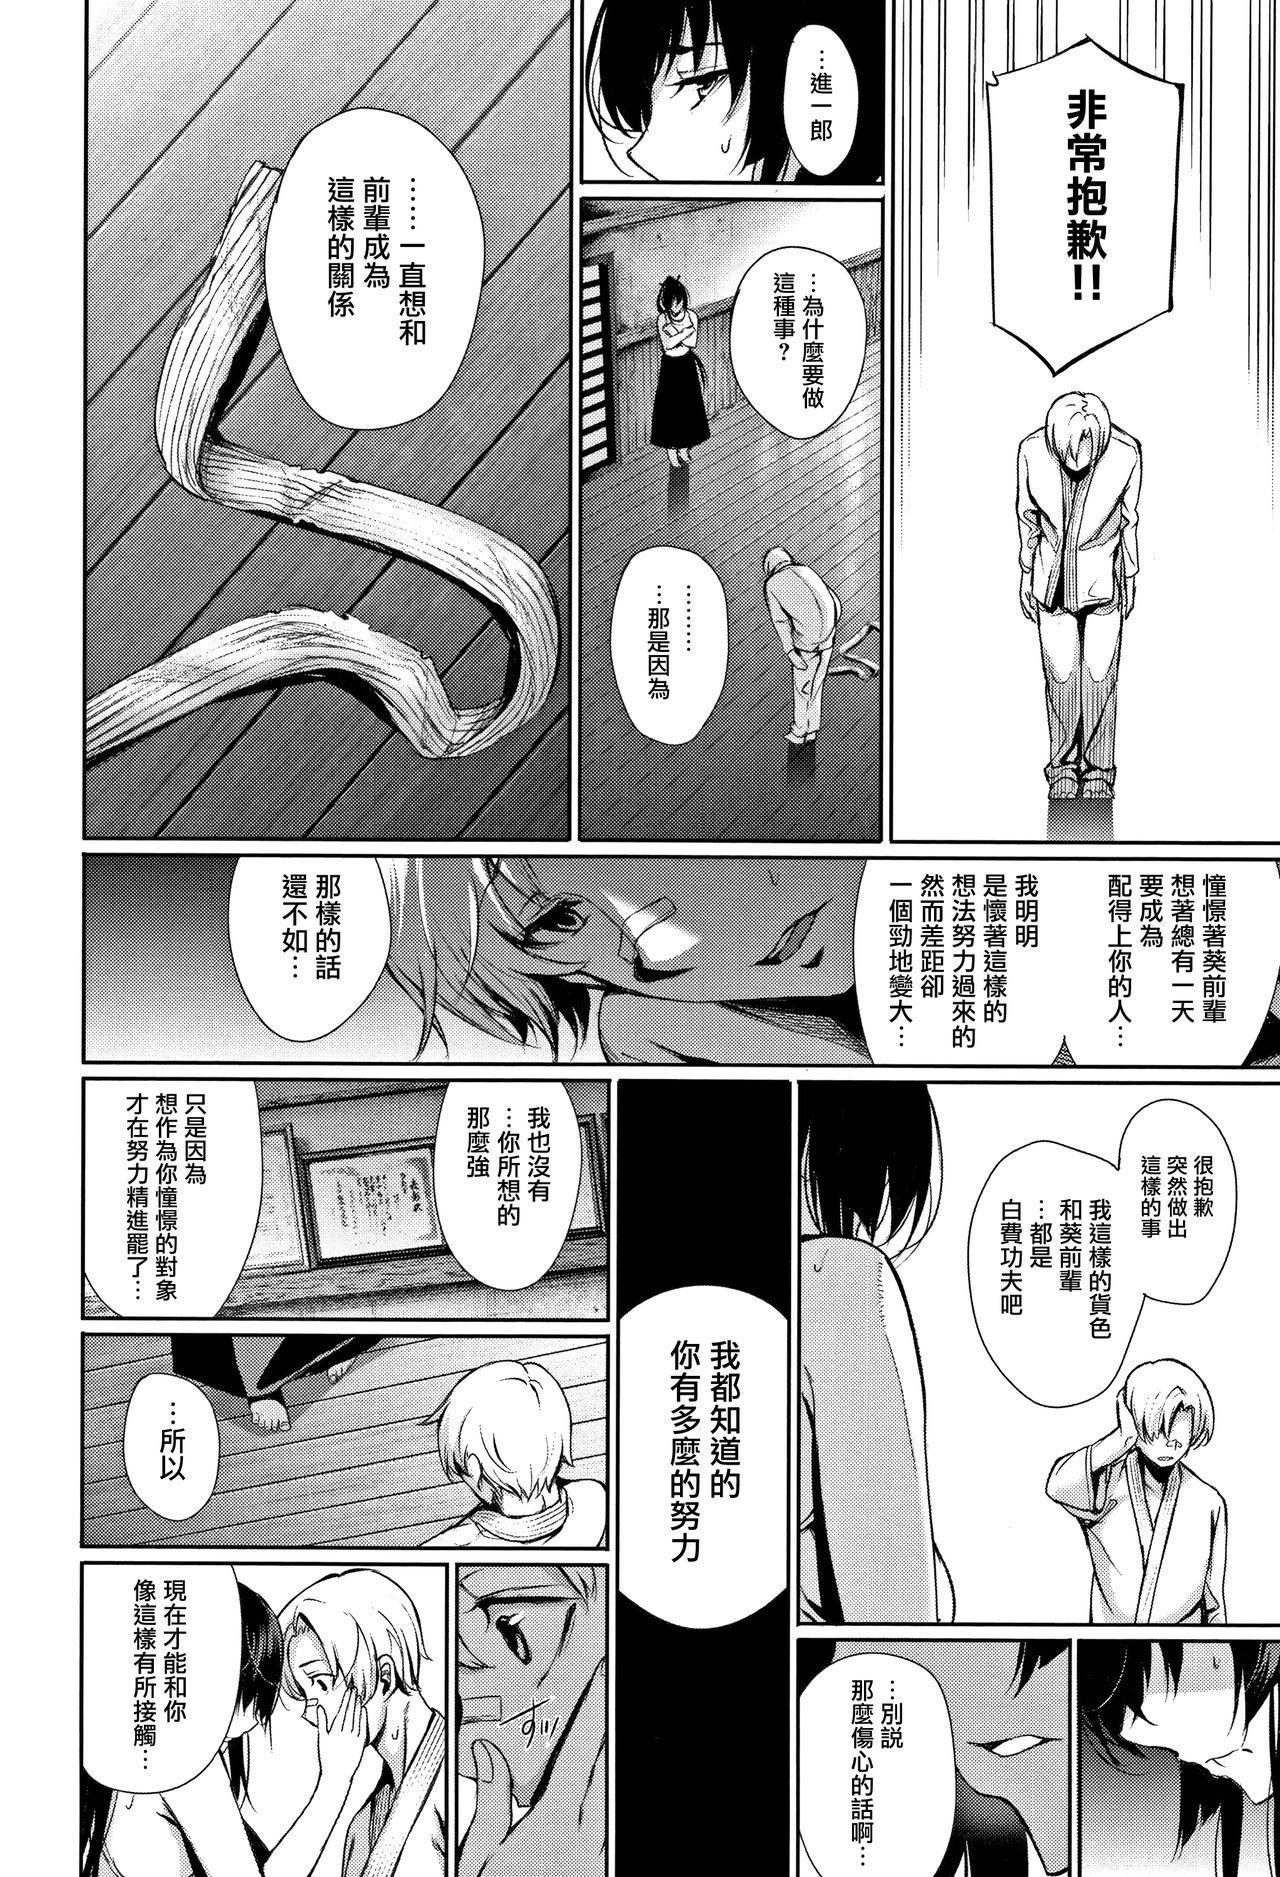 [Gentsuki] Kimi Omou Koi - I think of you. Ch. 1-7 [Chinese] [无毒汉化组] 16